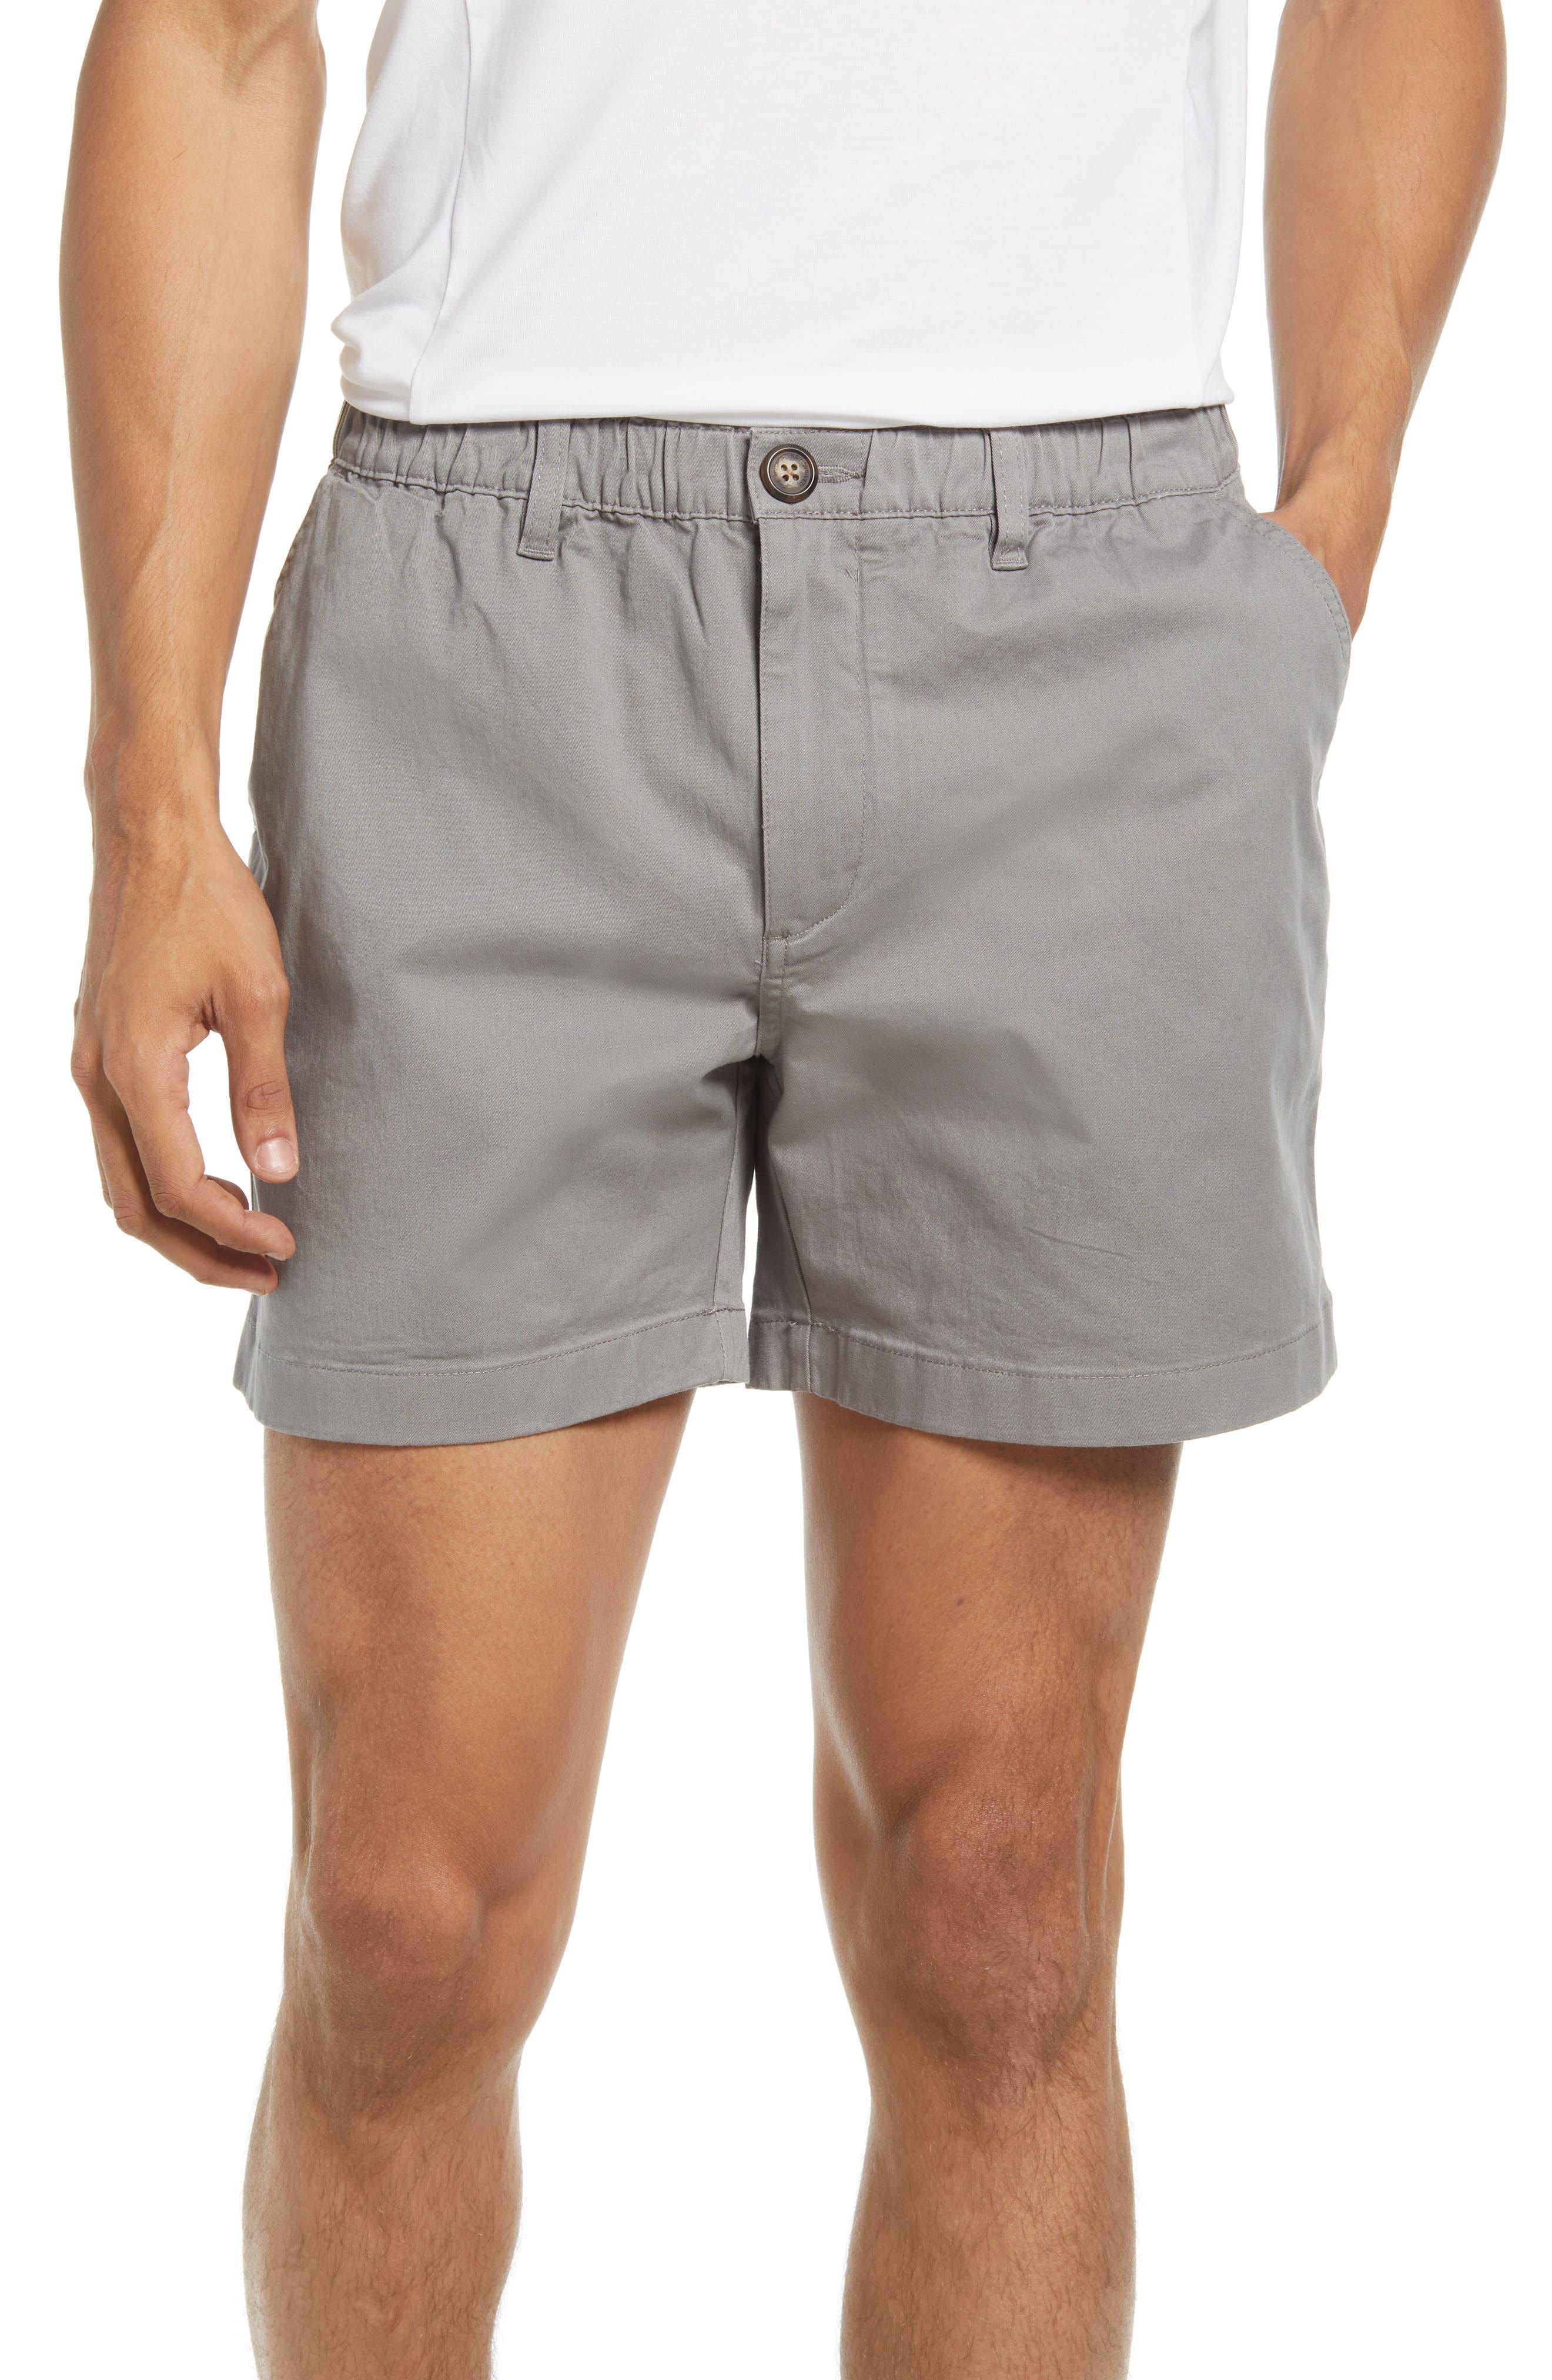 Silver Linings Shorts